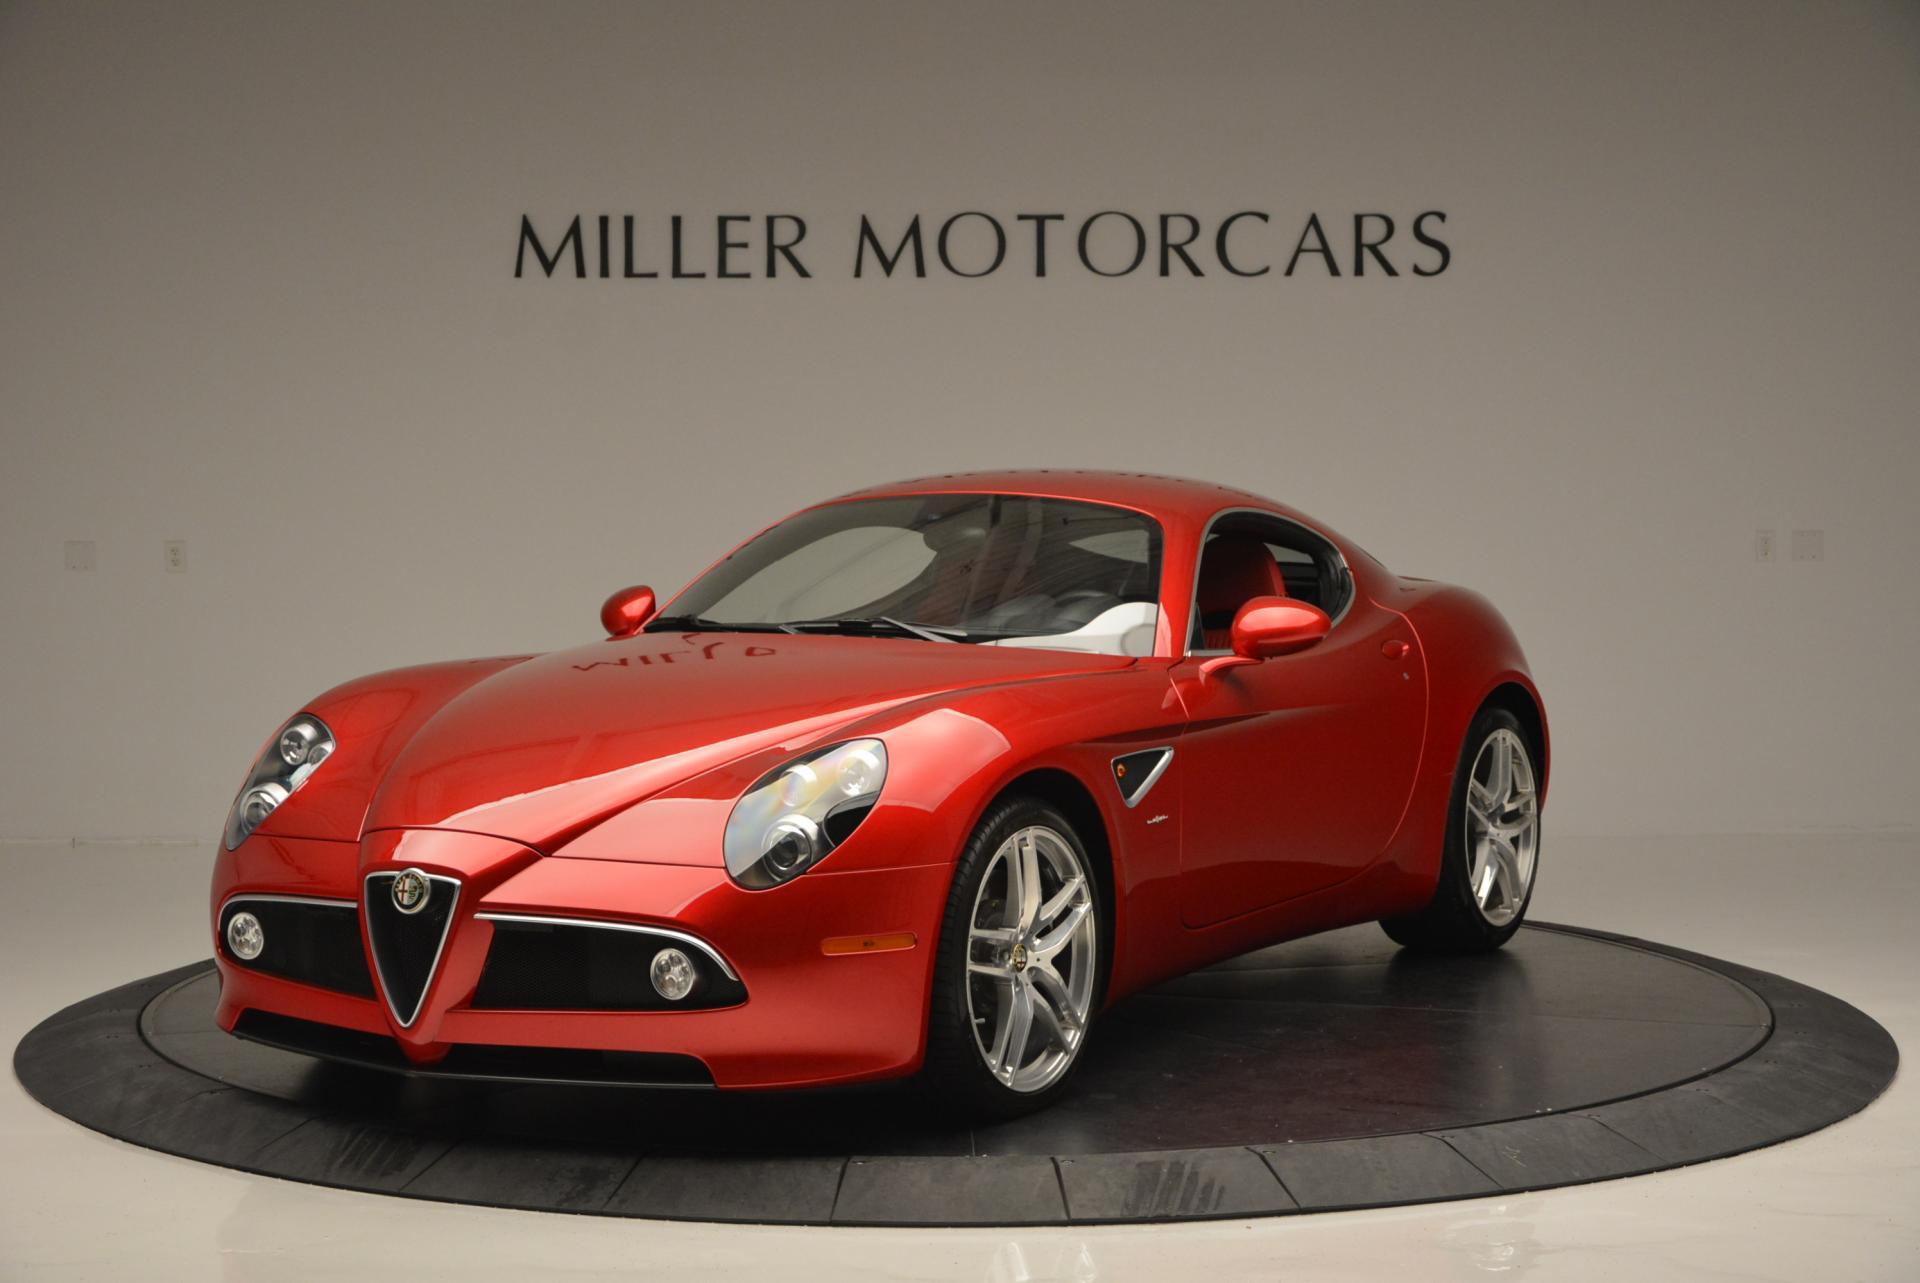 Used 2008 Alfa Romeo 8C  For Sale In Greenwich, CT. Alfa Romeo of Greenwich, 6562 7_main